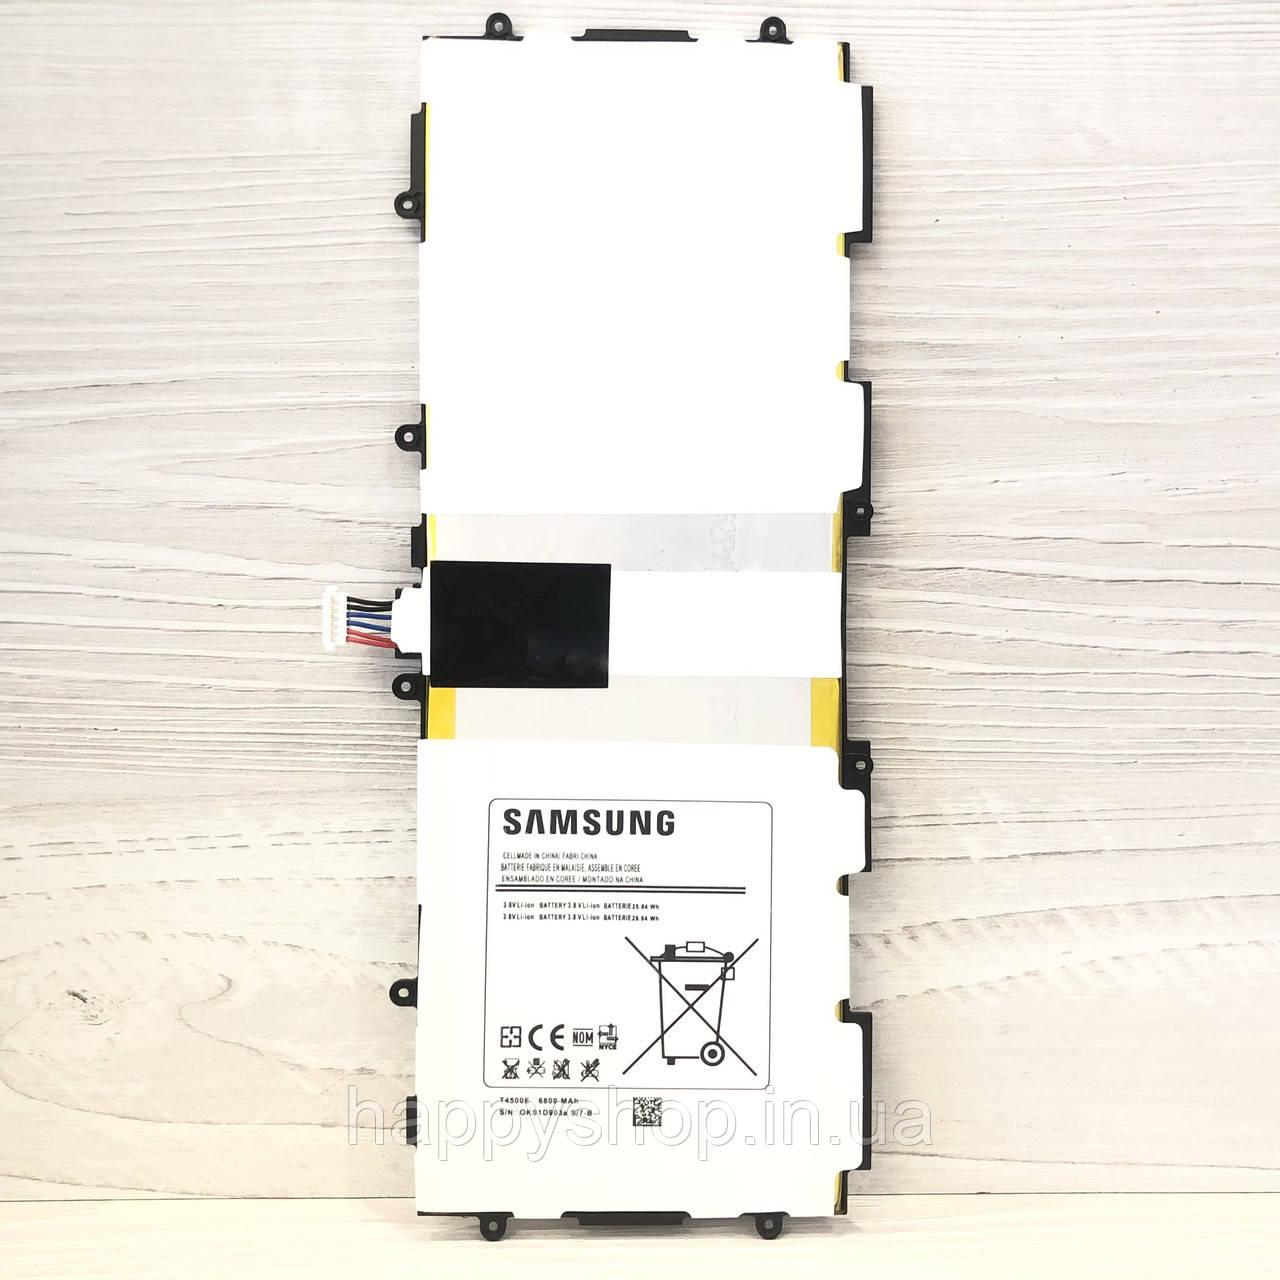 Оригинальная батарея для Samsung P5200/P5210 (T4500E)